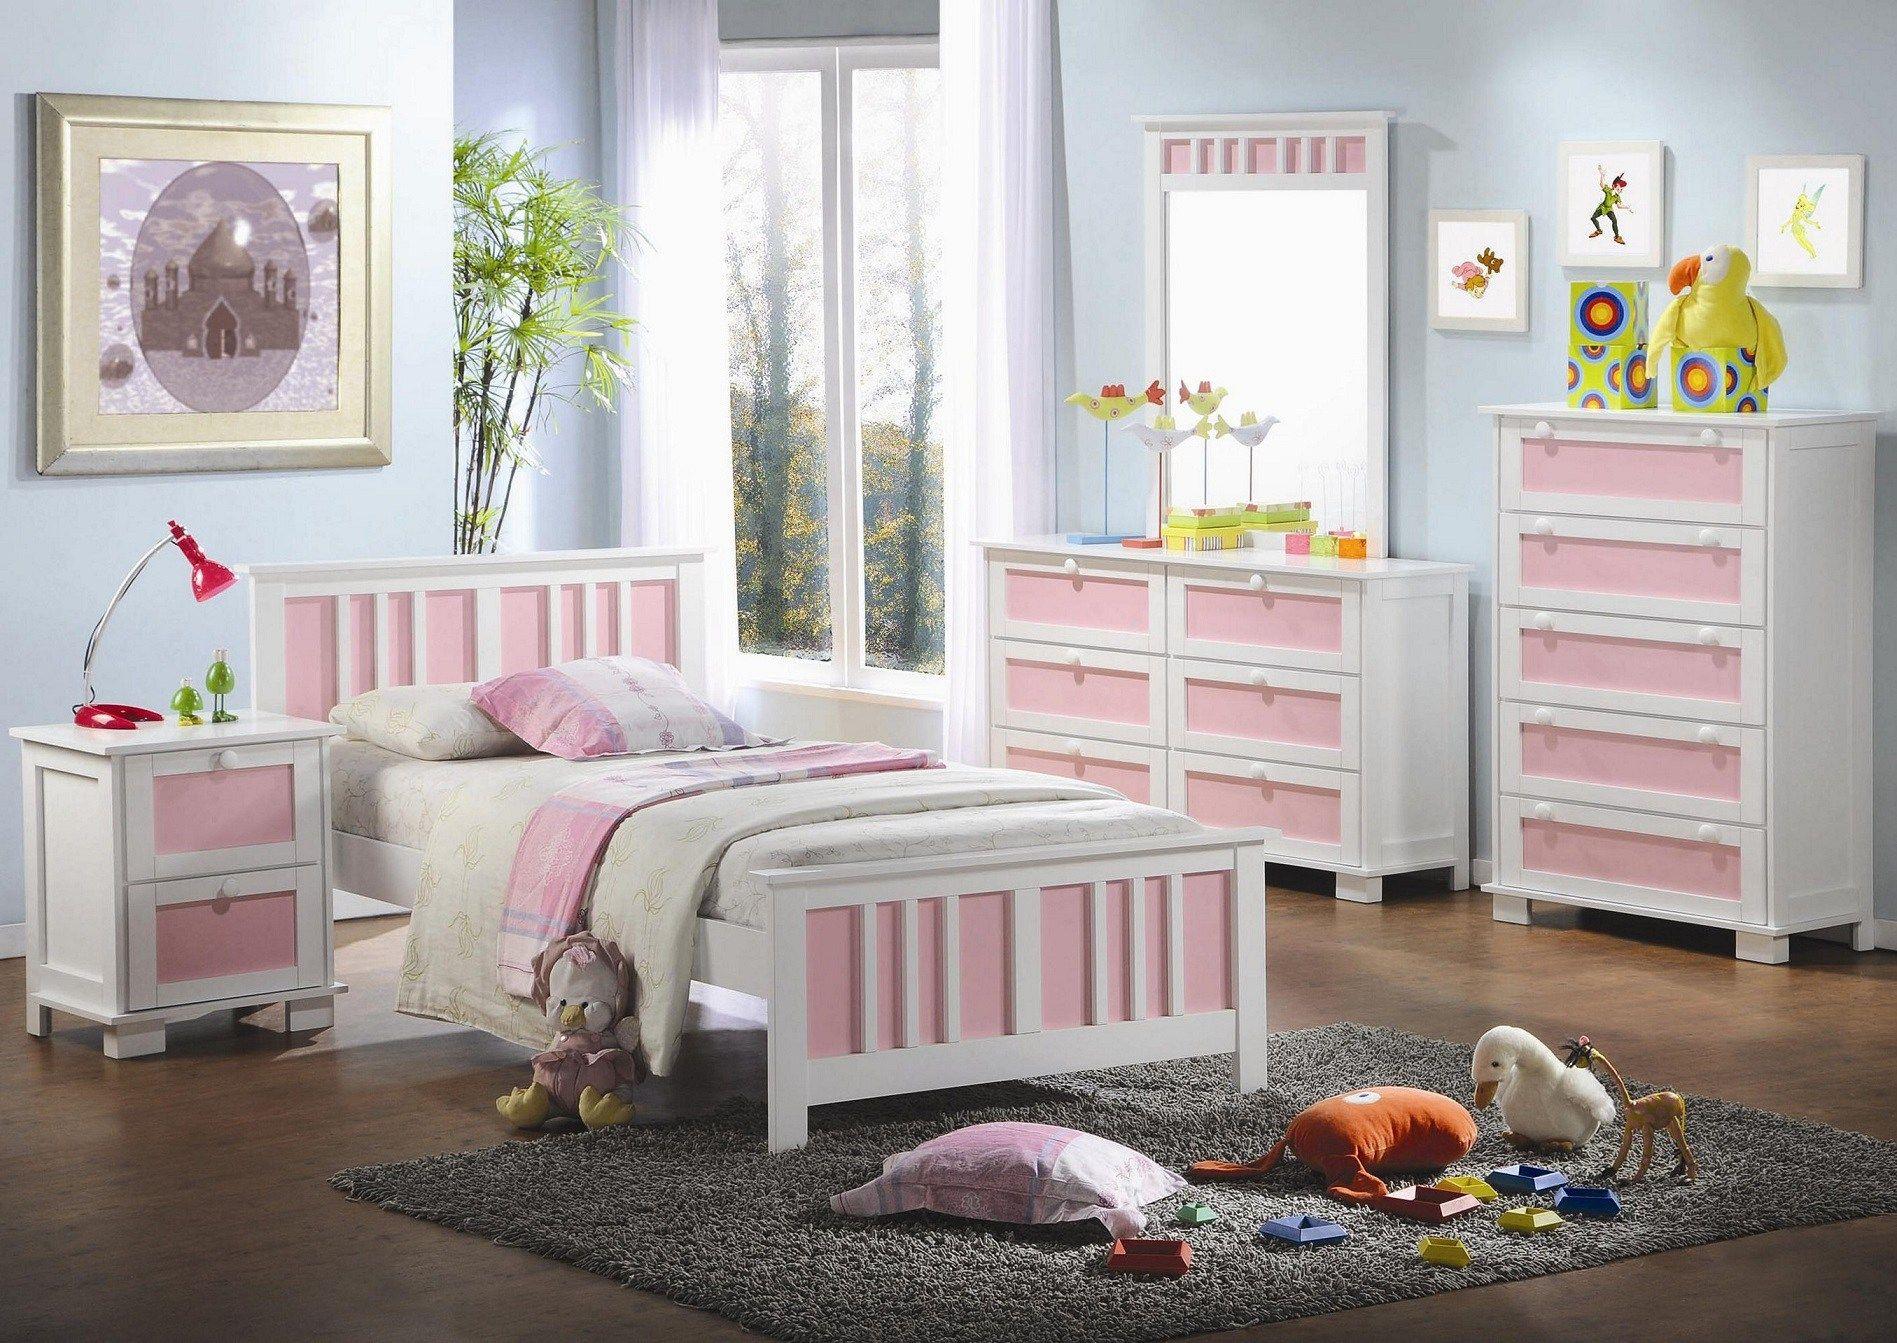 Modern Teenage Bedroom Furniture Regarding Furniture For Teenage Girl Bedrooms Ideas For Decorating Teenage Bedroom Furniture Girls Bedroom Sets Bedroom Design